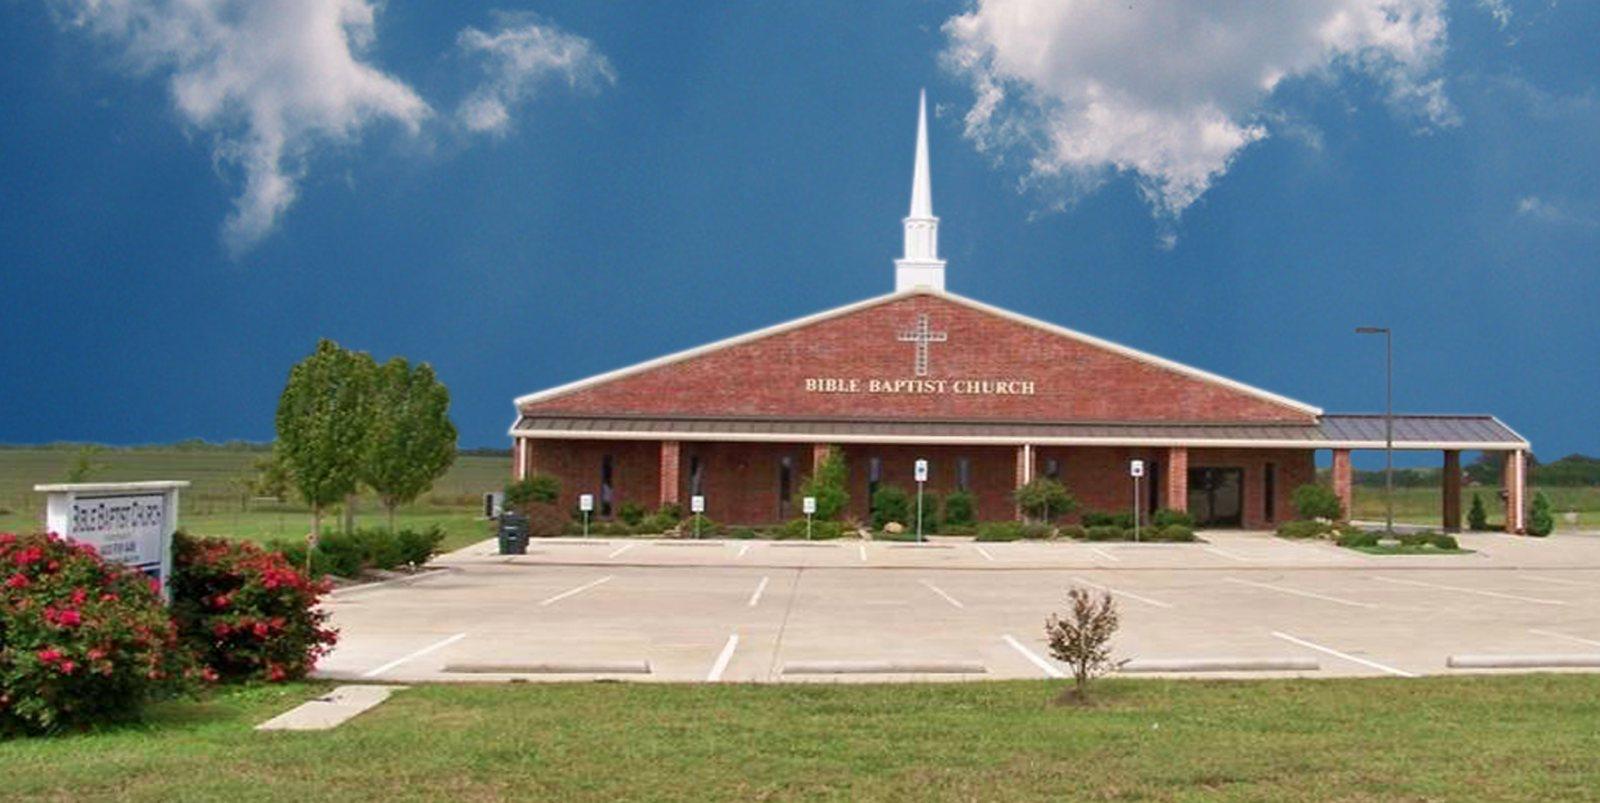 bible-baptist-church-waxahachie-texas